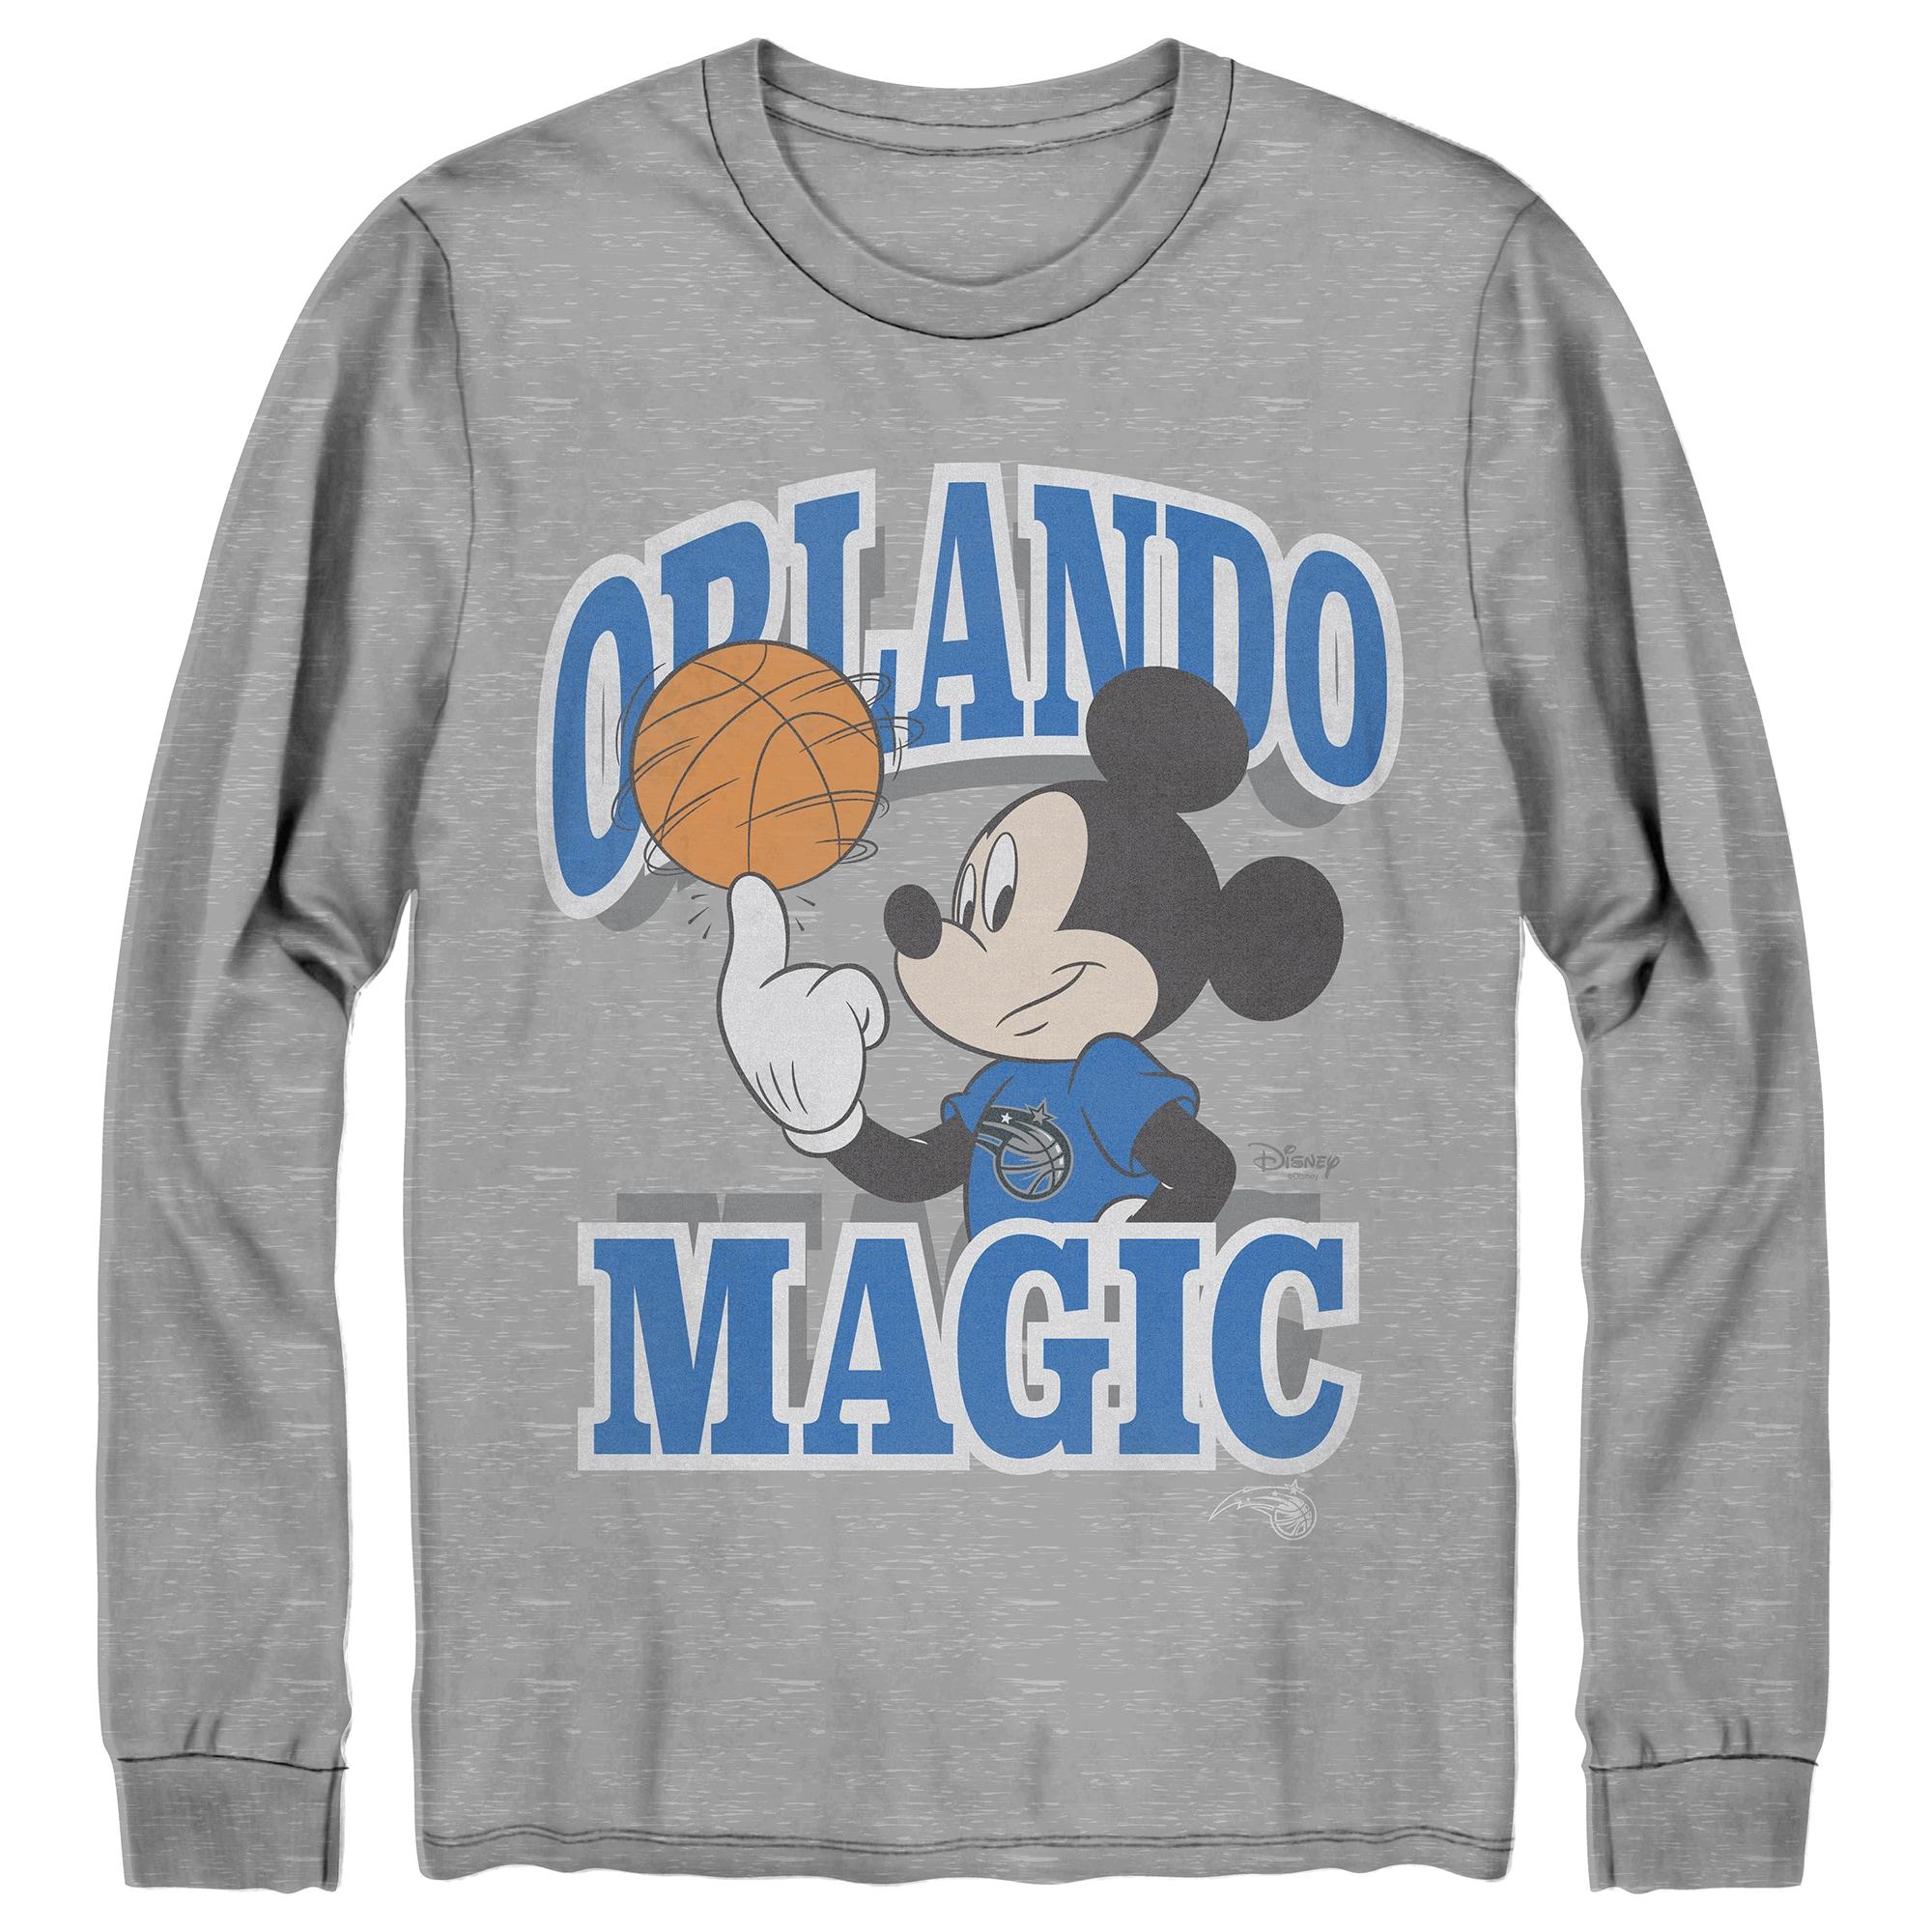 Orlando Magic Junk Food Disney Mickey Team Spirit Long Sleeve T-Shirt - Gray